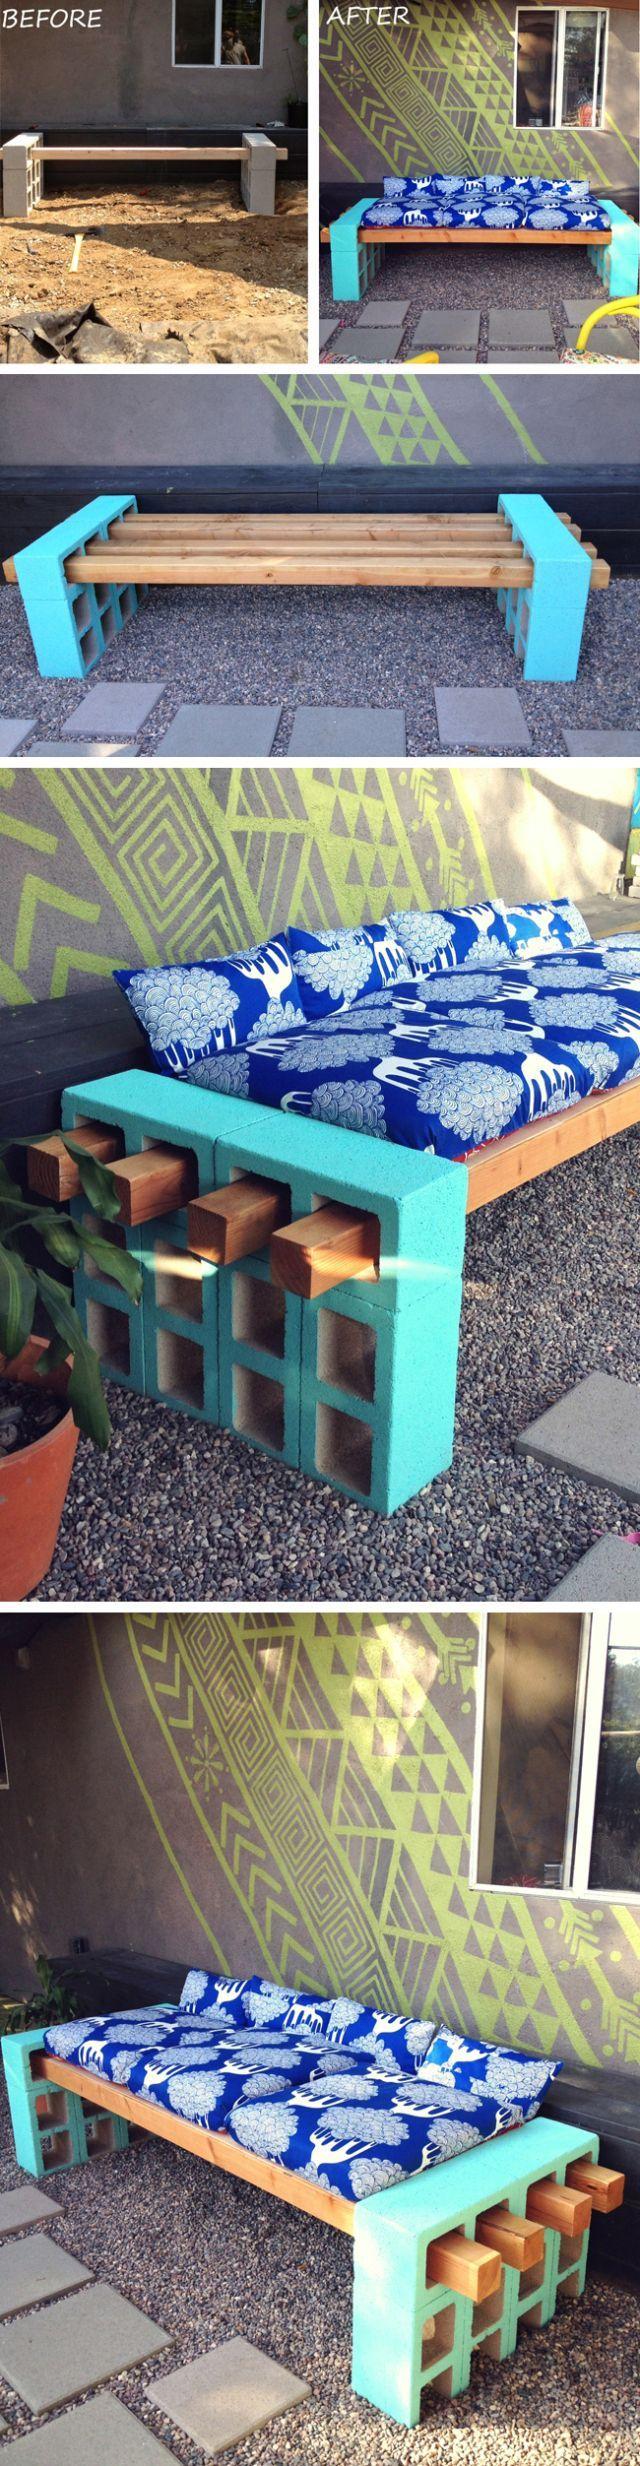 DIY concrete block bench seating   furniture design   awesome DIY inspiration #product_design